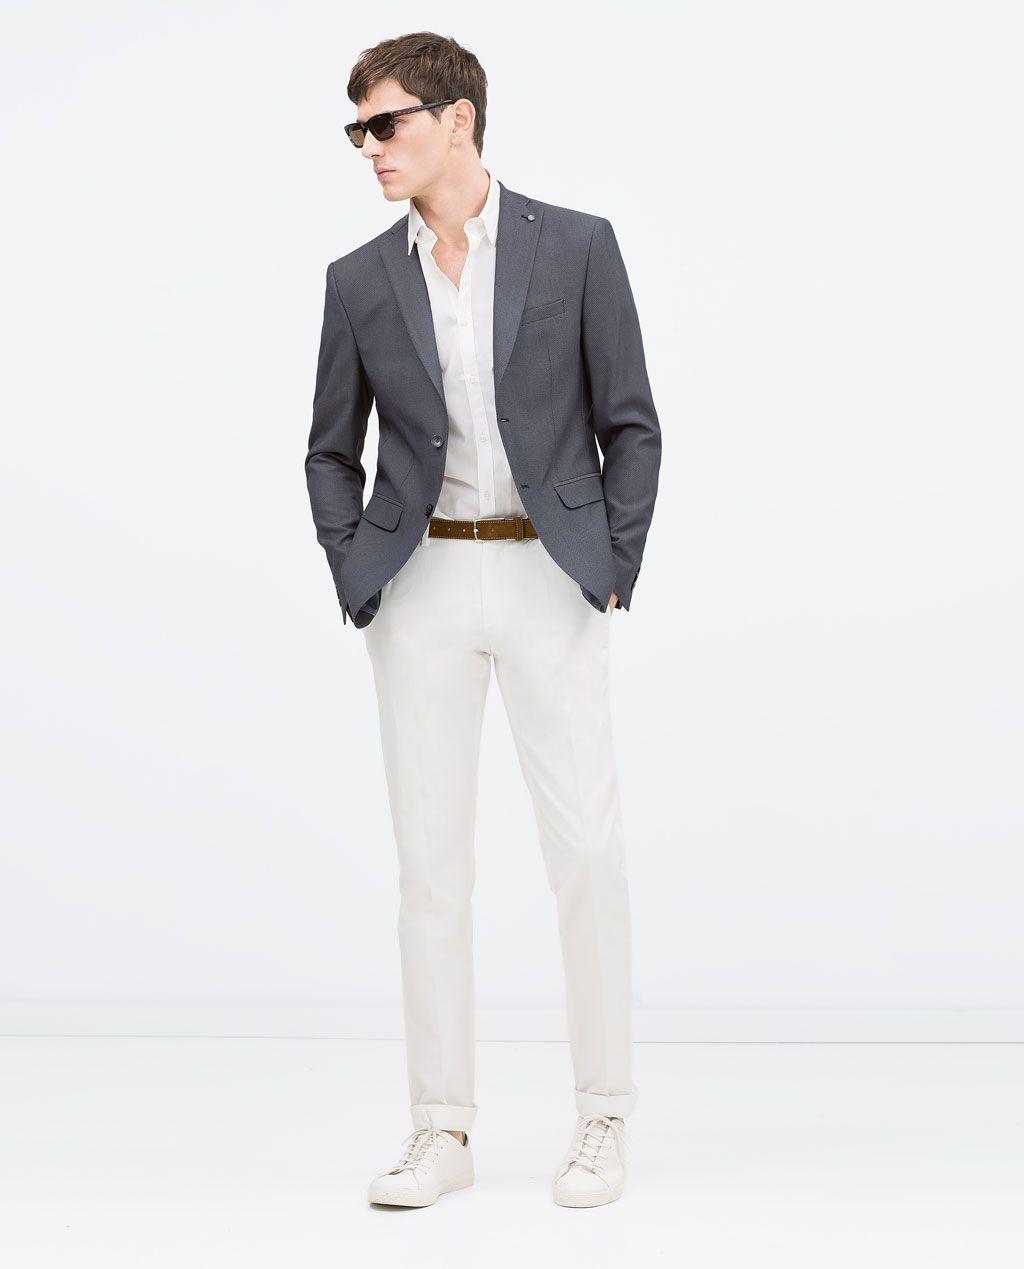 33cc203a1455 Image 1 de BLAZER AVEC COUDIÈRES de Zara Mode Masculine